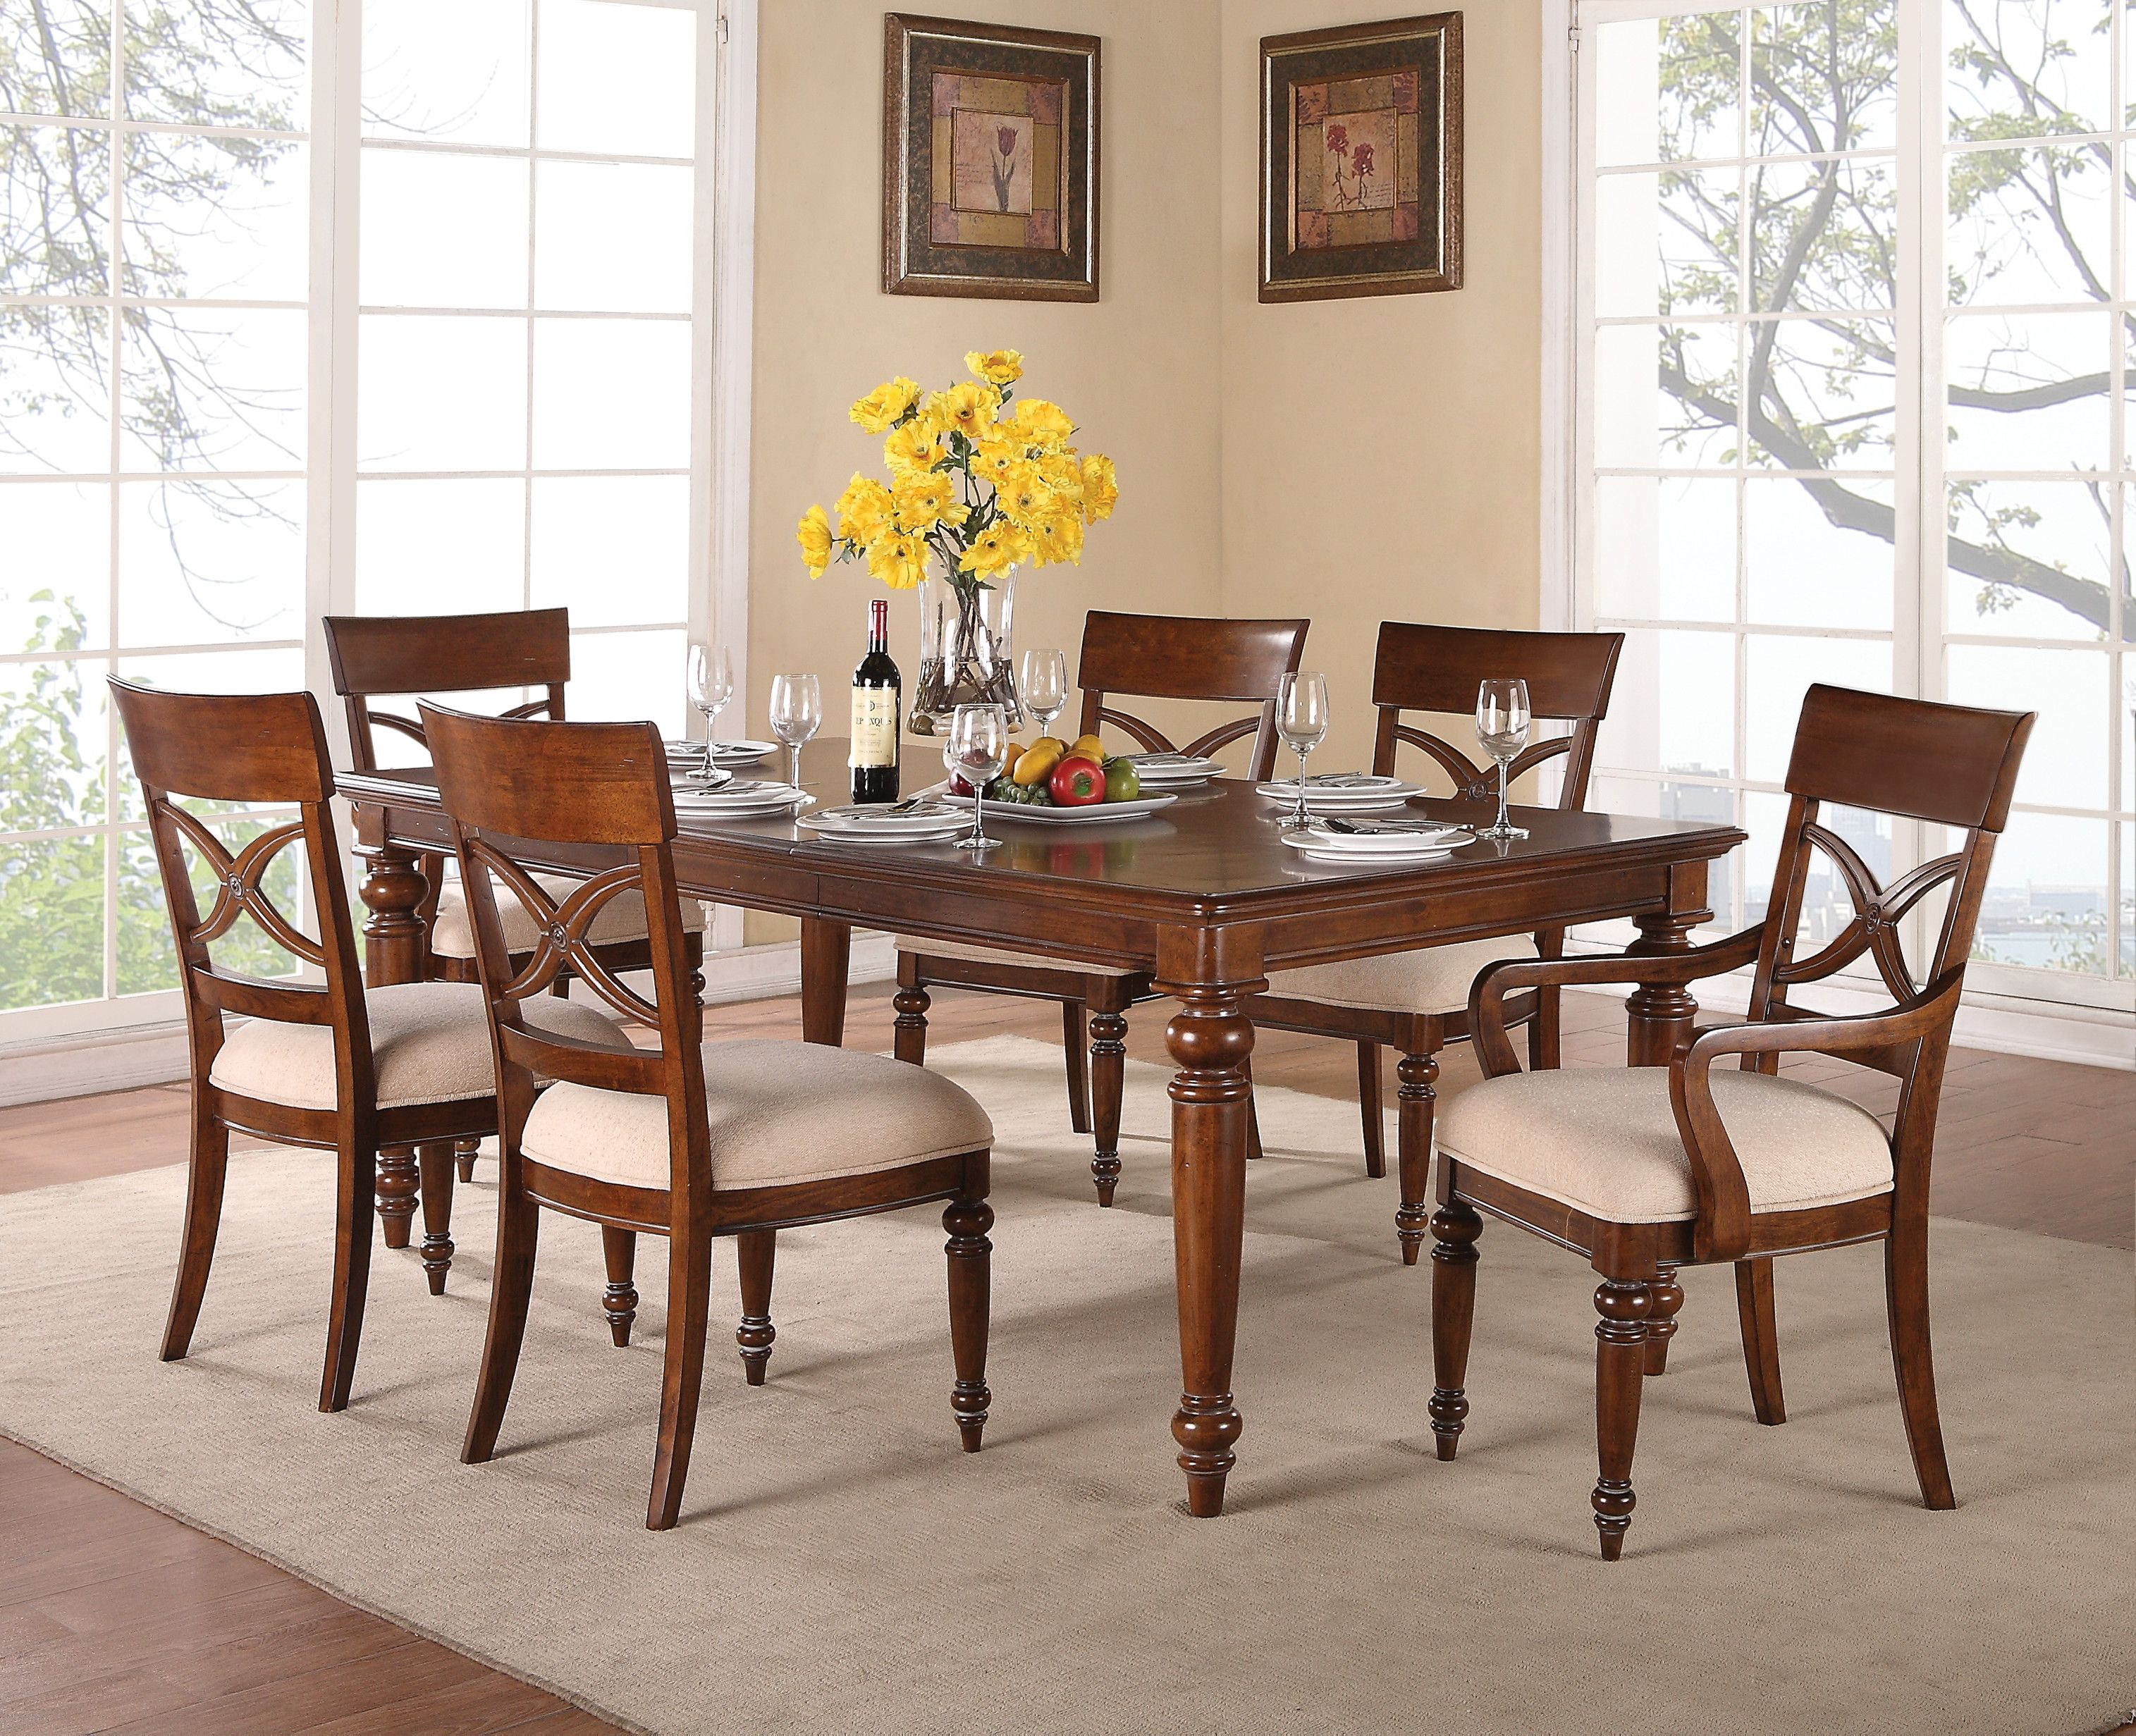 Flexsteel Wynwood American Heritage 7 Piece Dining Set W1809 830 Table 840 Armless Side Chair X4 841 Arm X2 Shopac